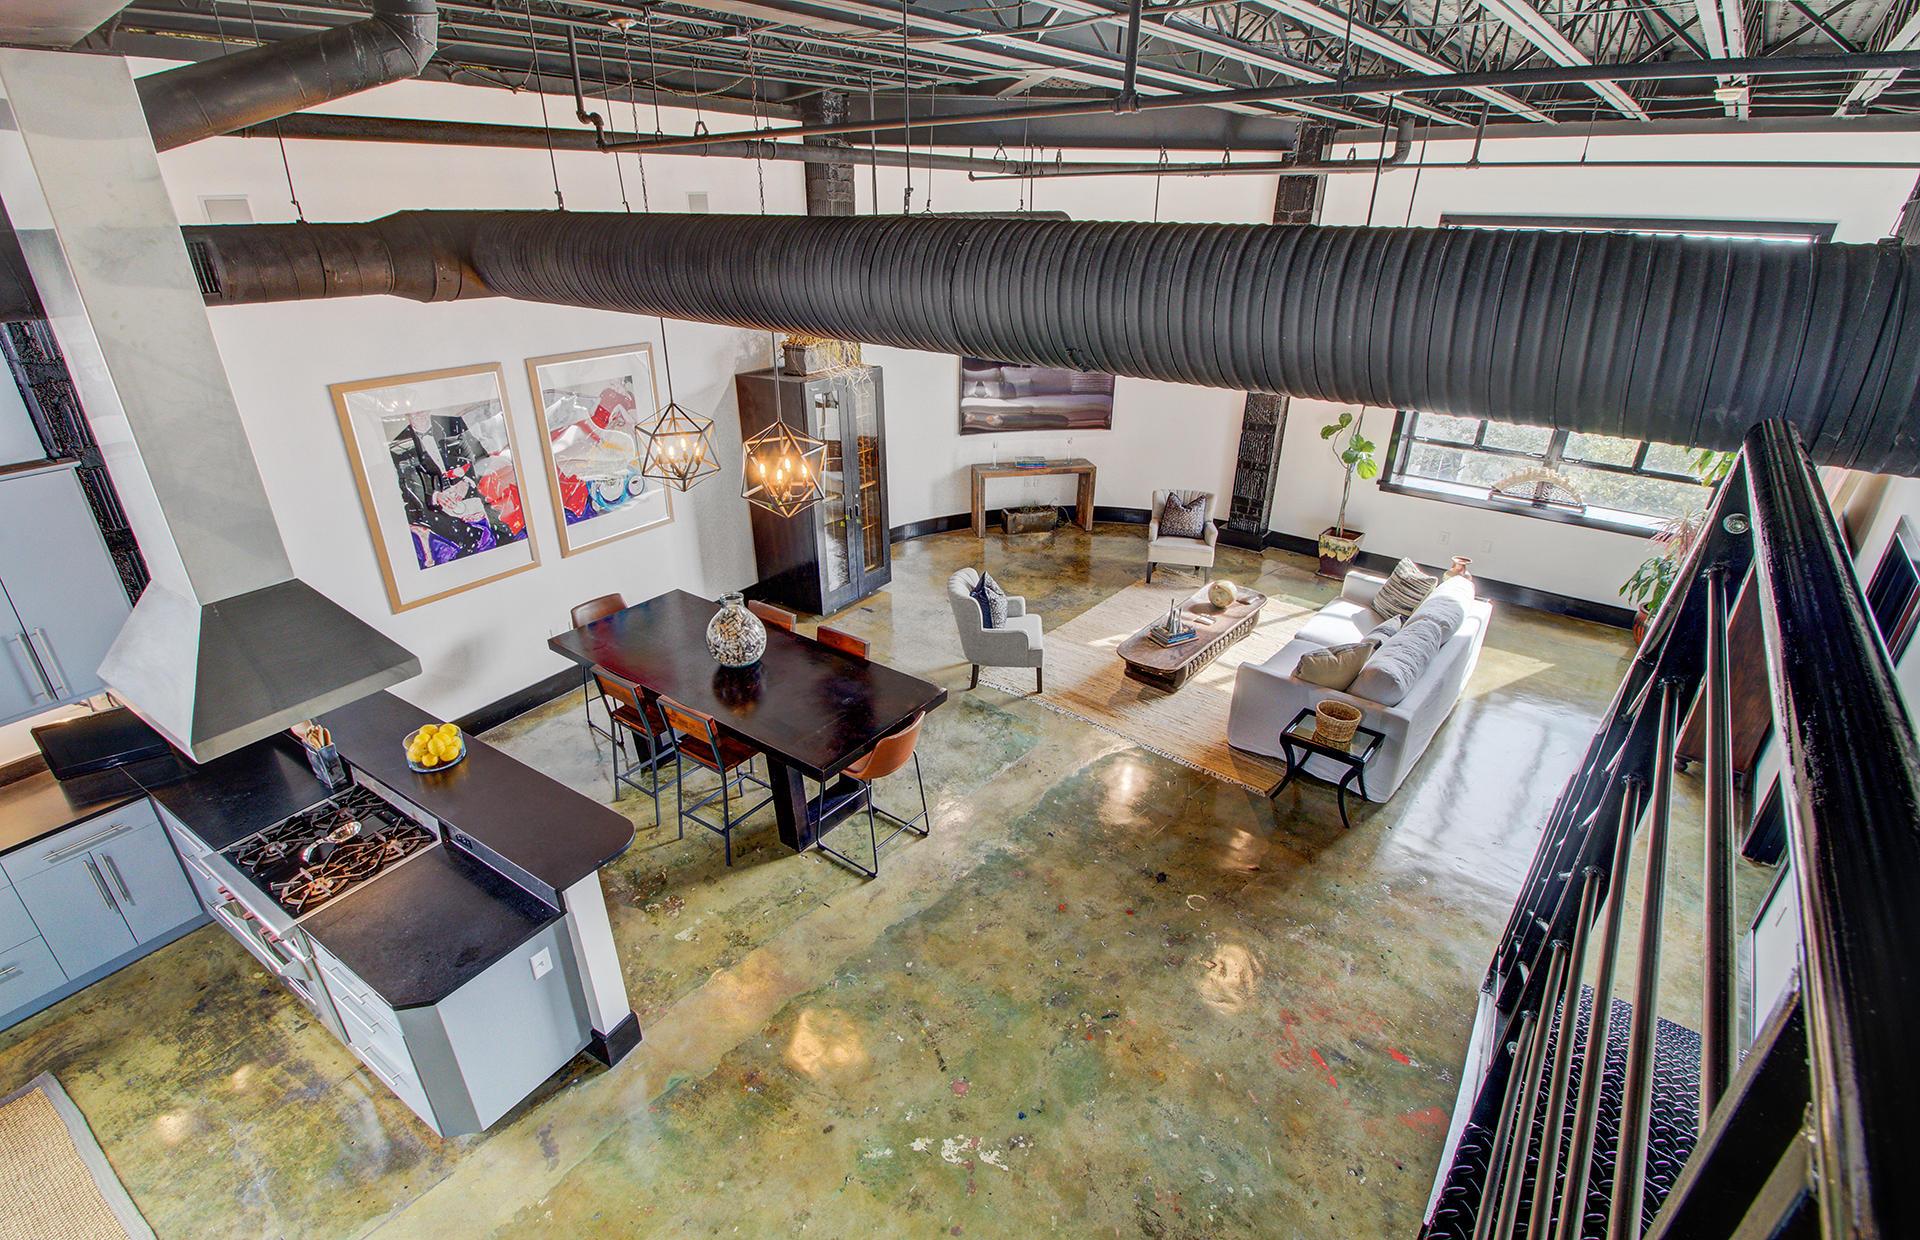 King Street Lofts Homes For Sale - 517 King, Charleston, SC - 41